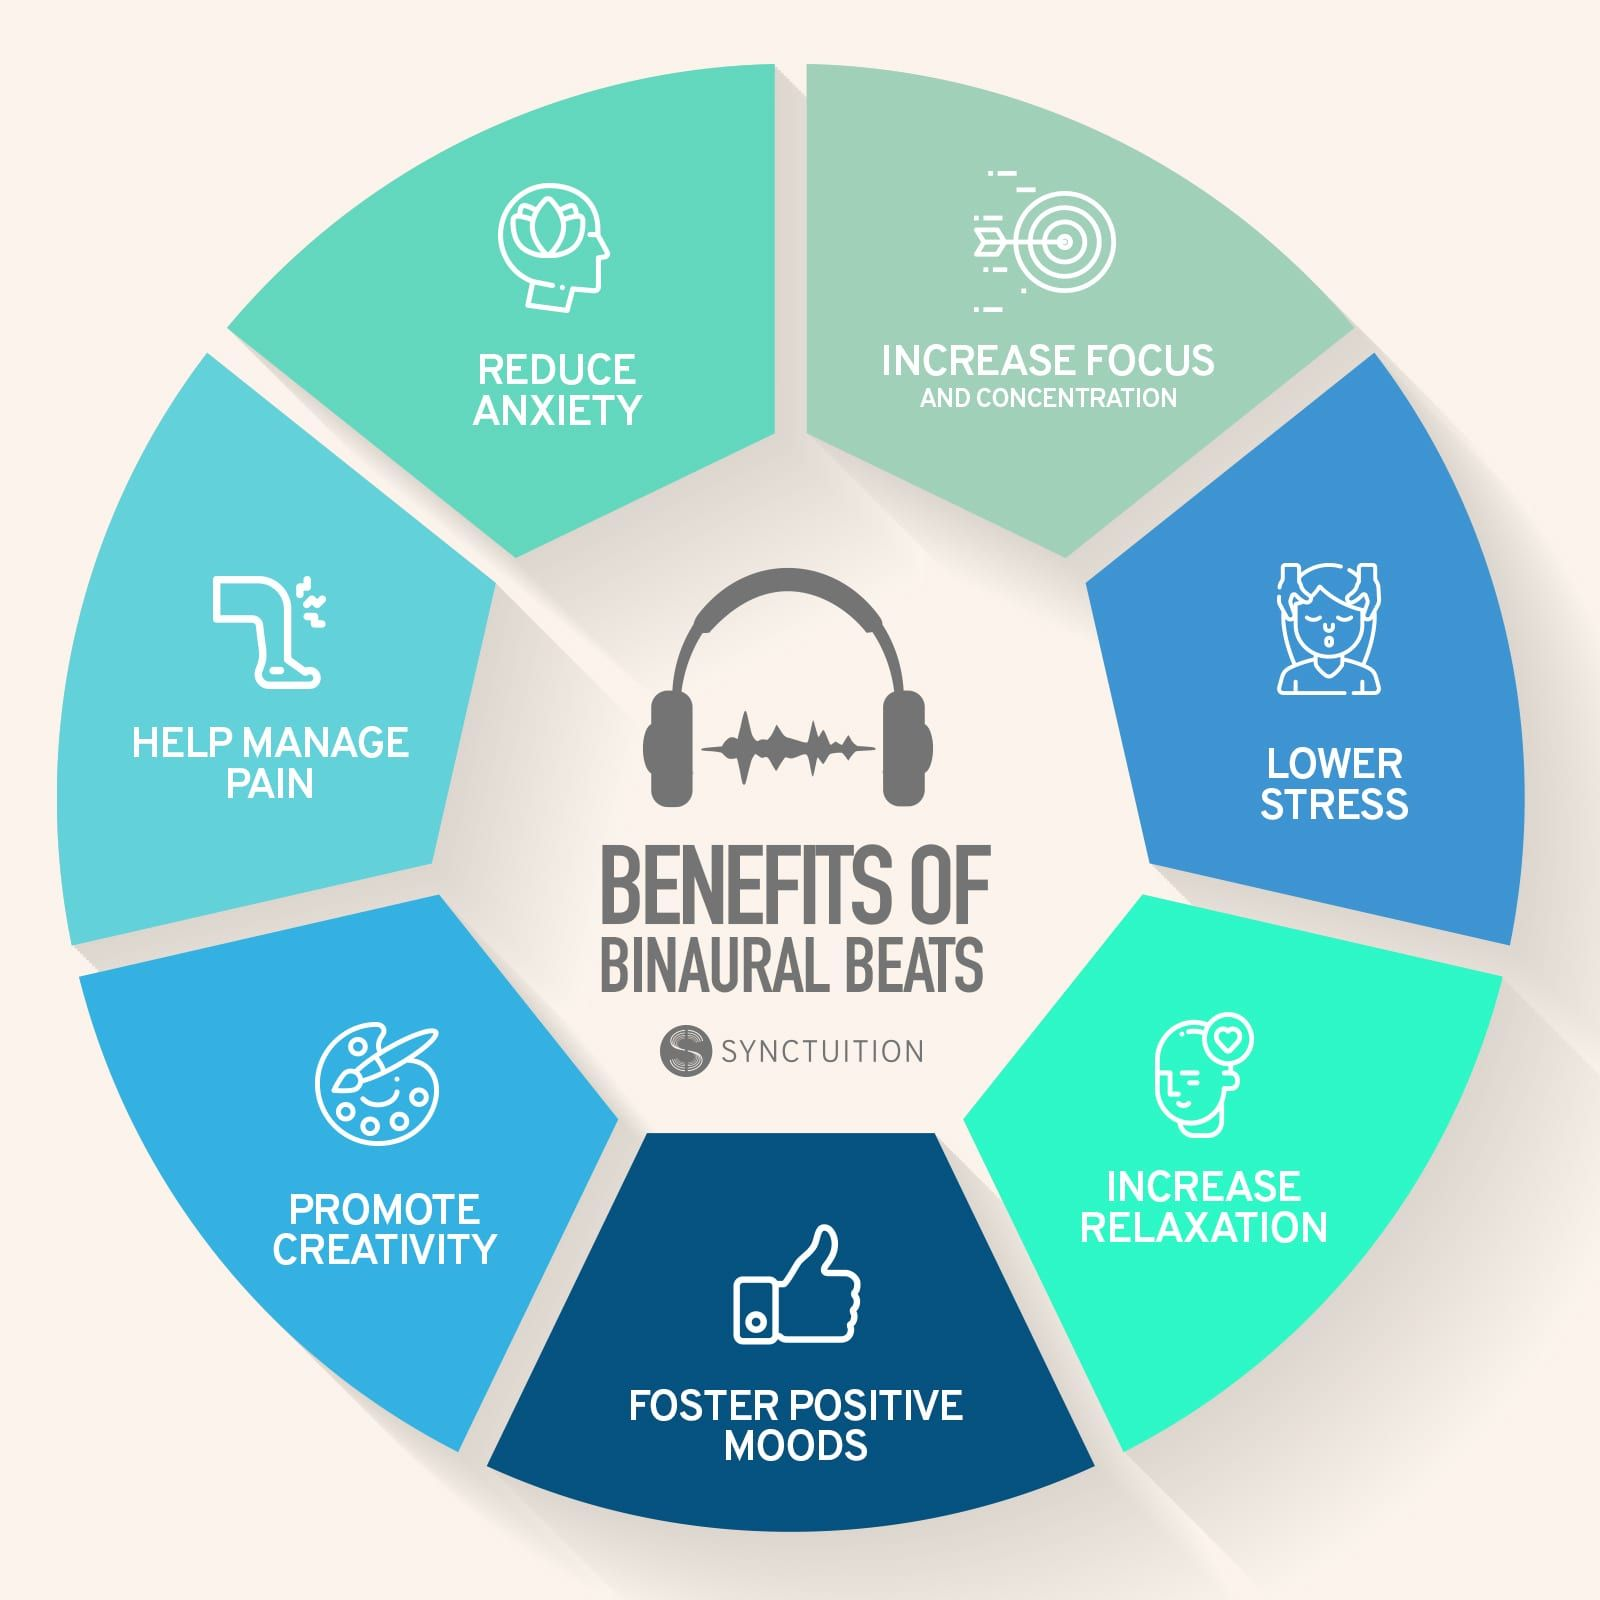 benefits of binaural beats binaural beats brain waves meditation benefits